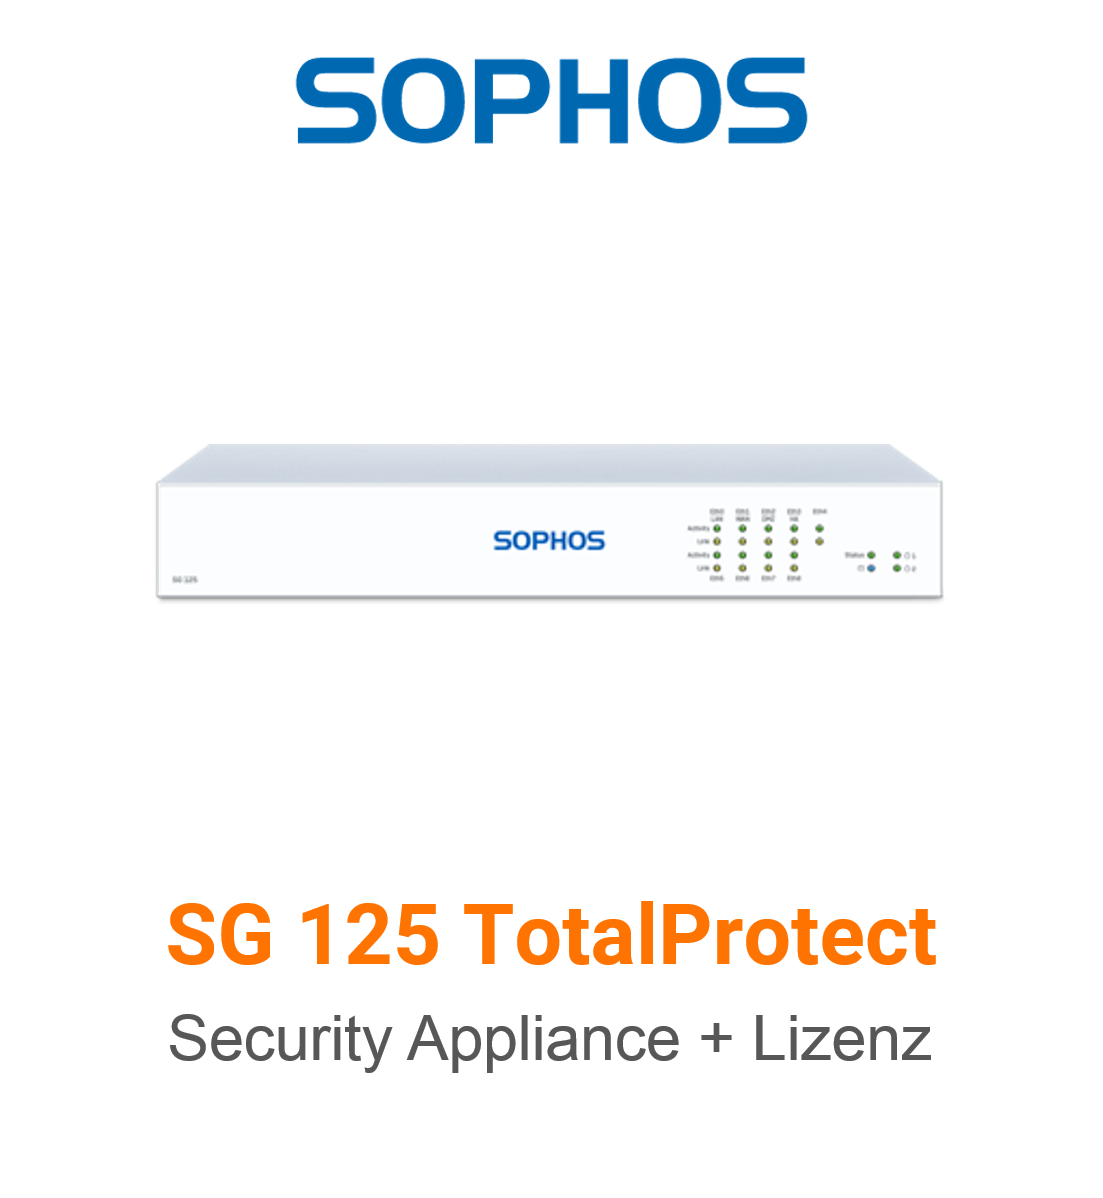 Sophos SG 125 TotalProtect Bundle (Hardware + Lizenz)